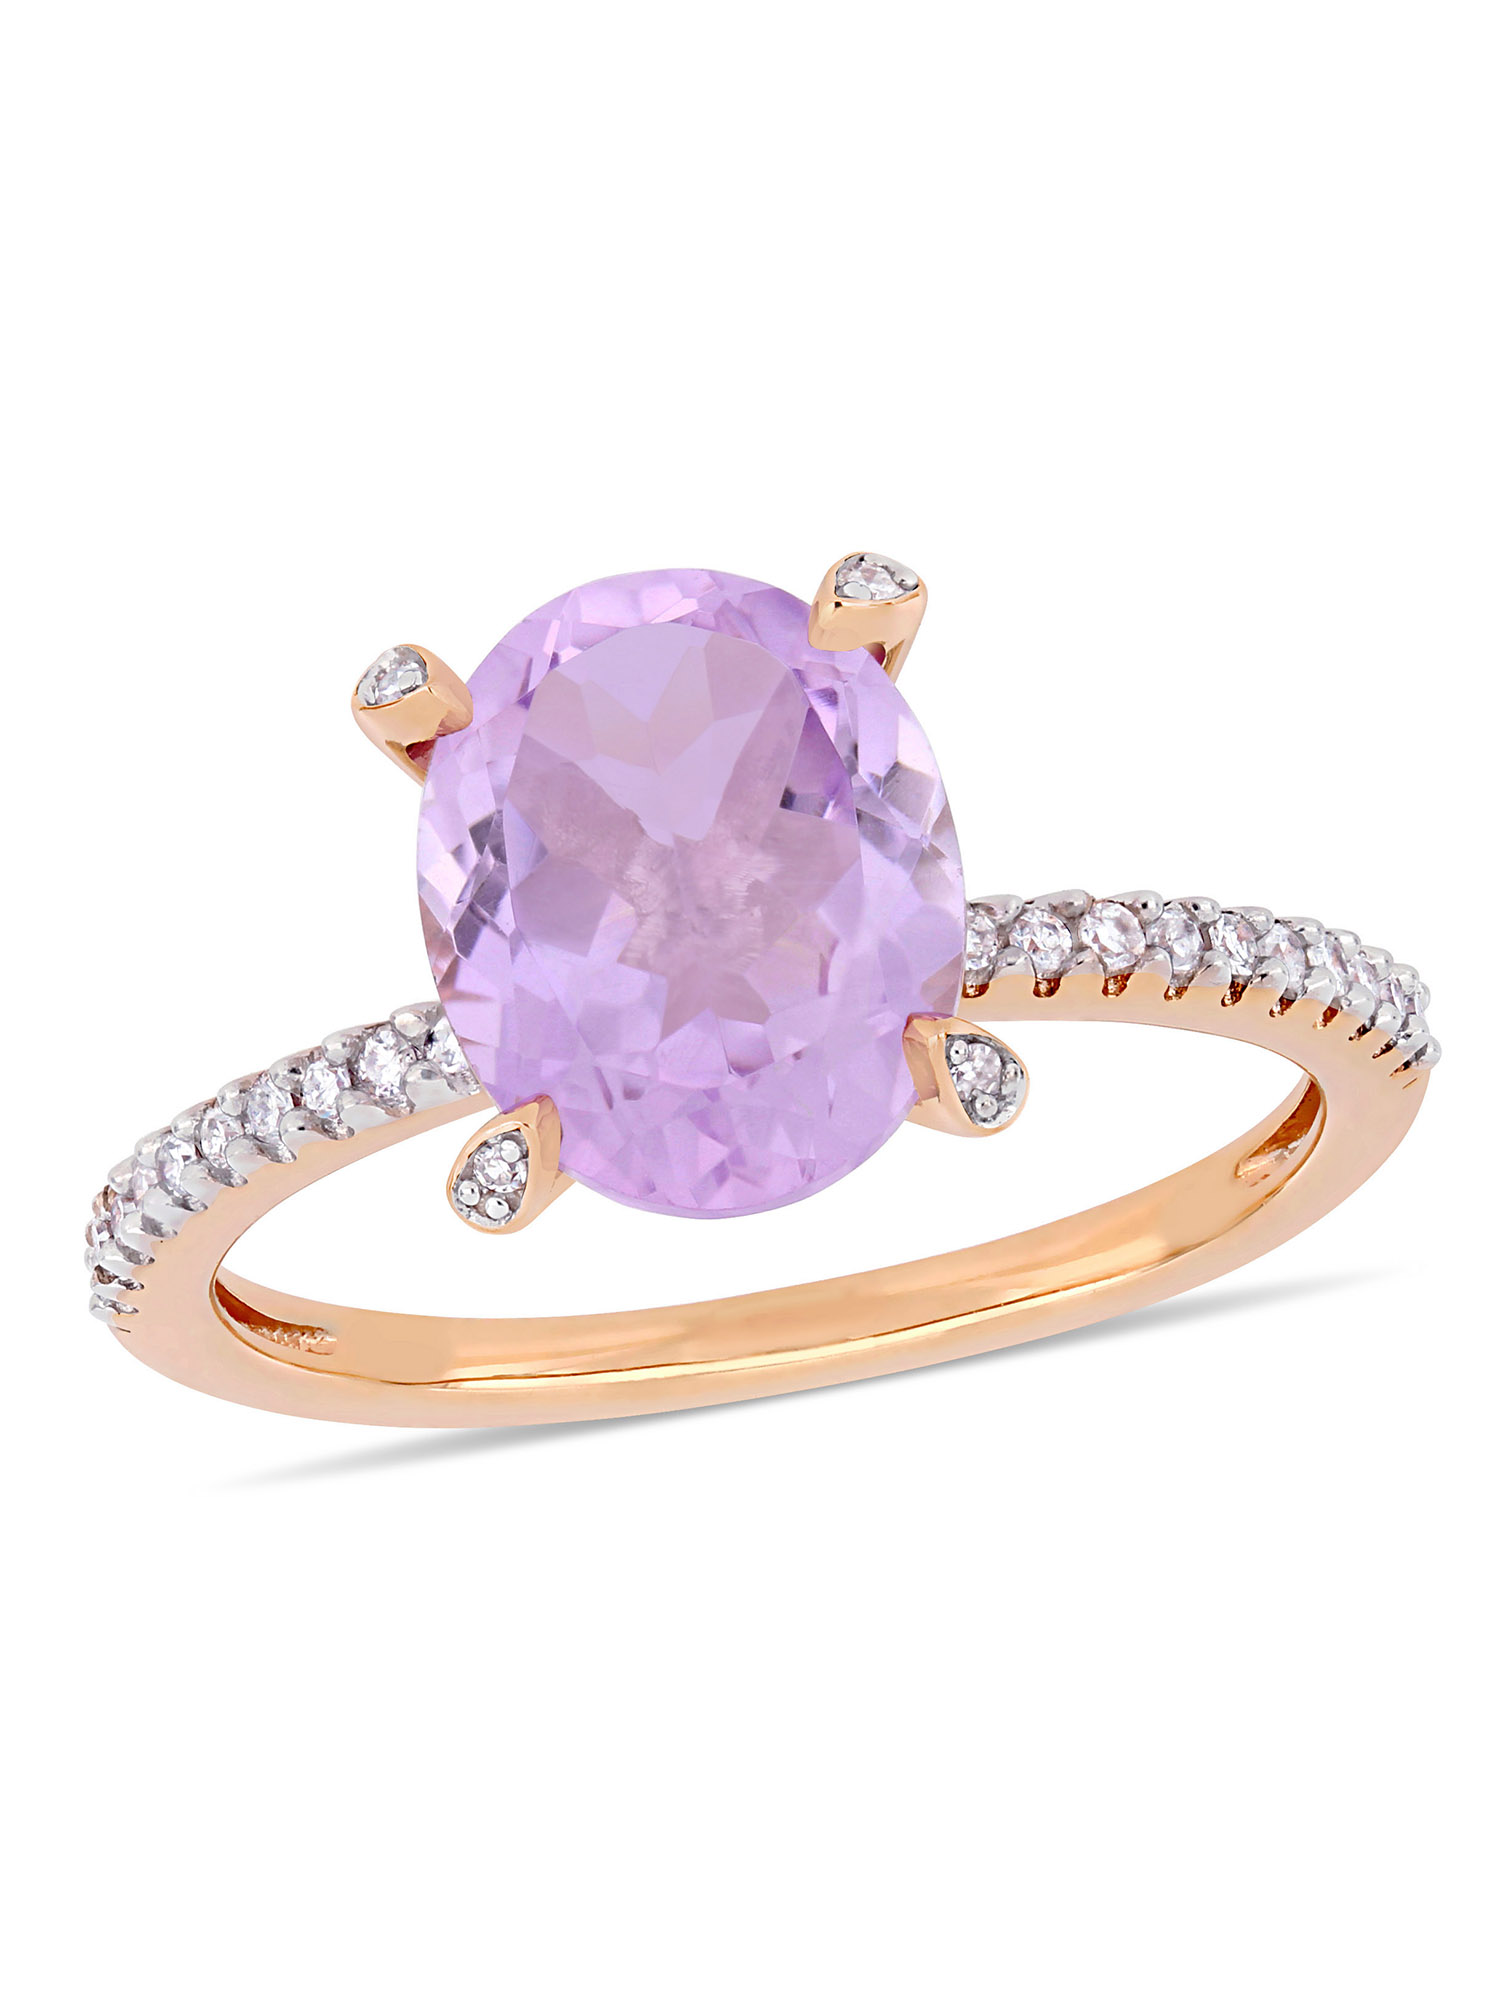 Tangelo 2-3/8 Carat T.G.W. Rose de France and 1/10 Carat T.W. Diamond 10kt Rose Gold Engagement Ring